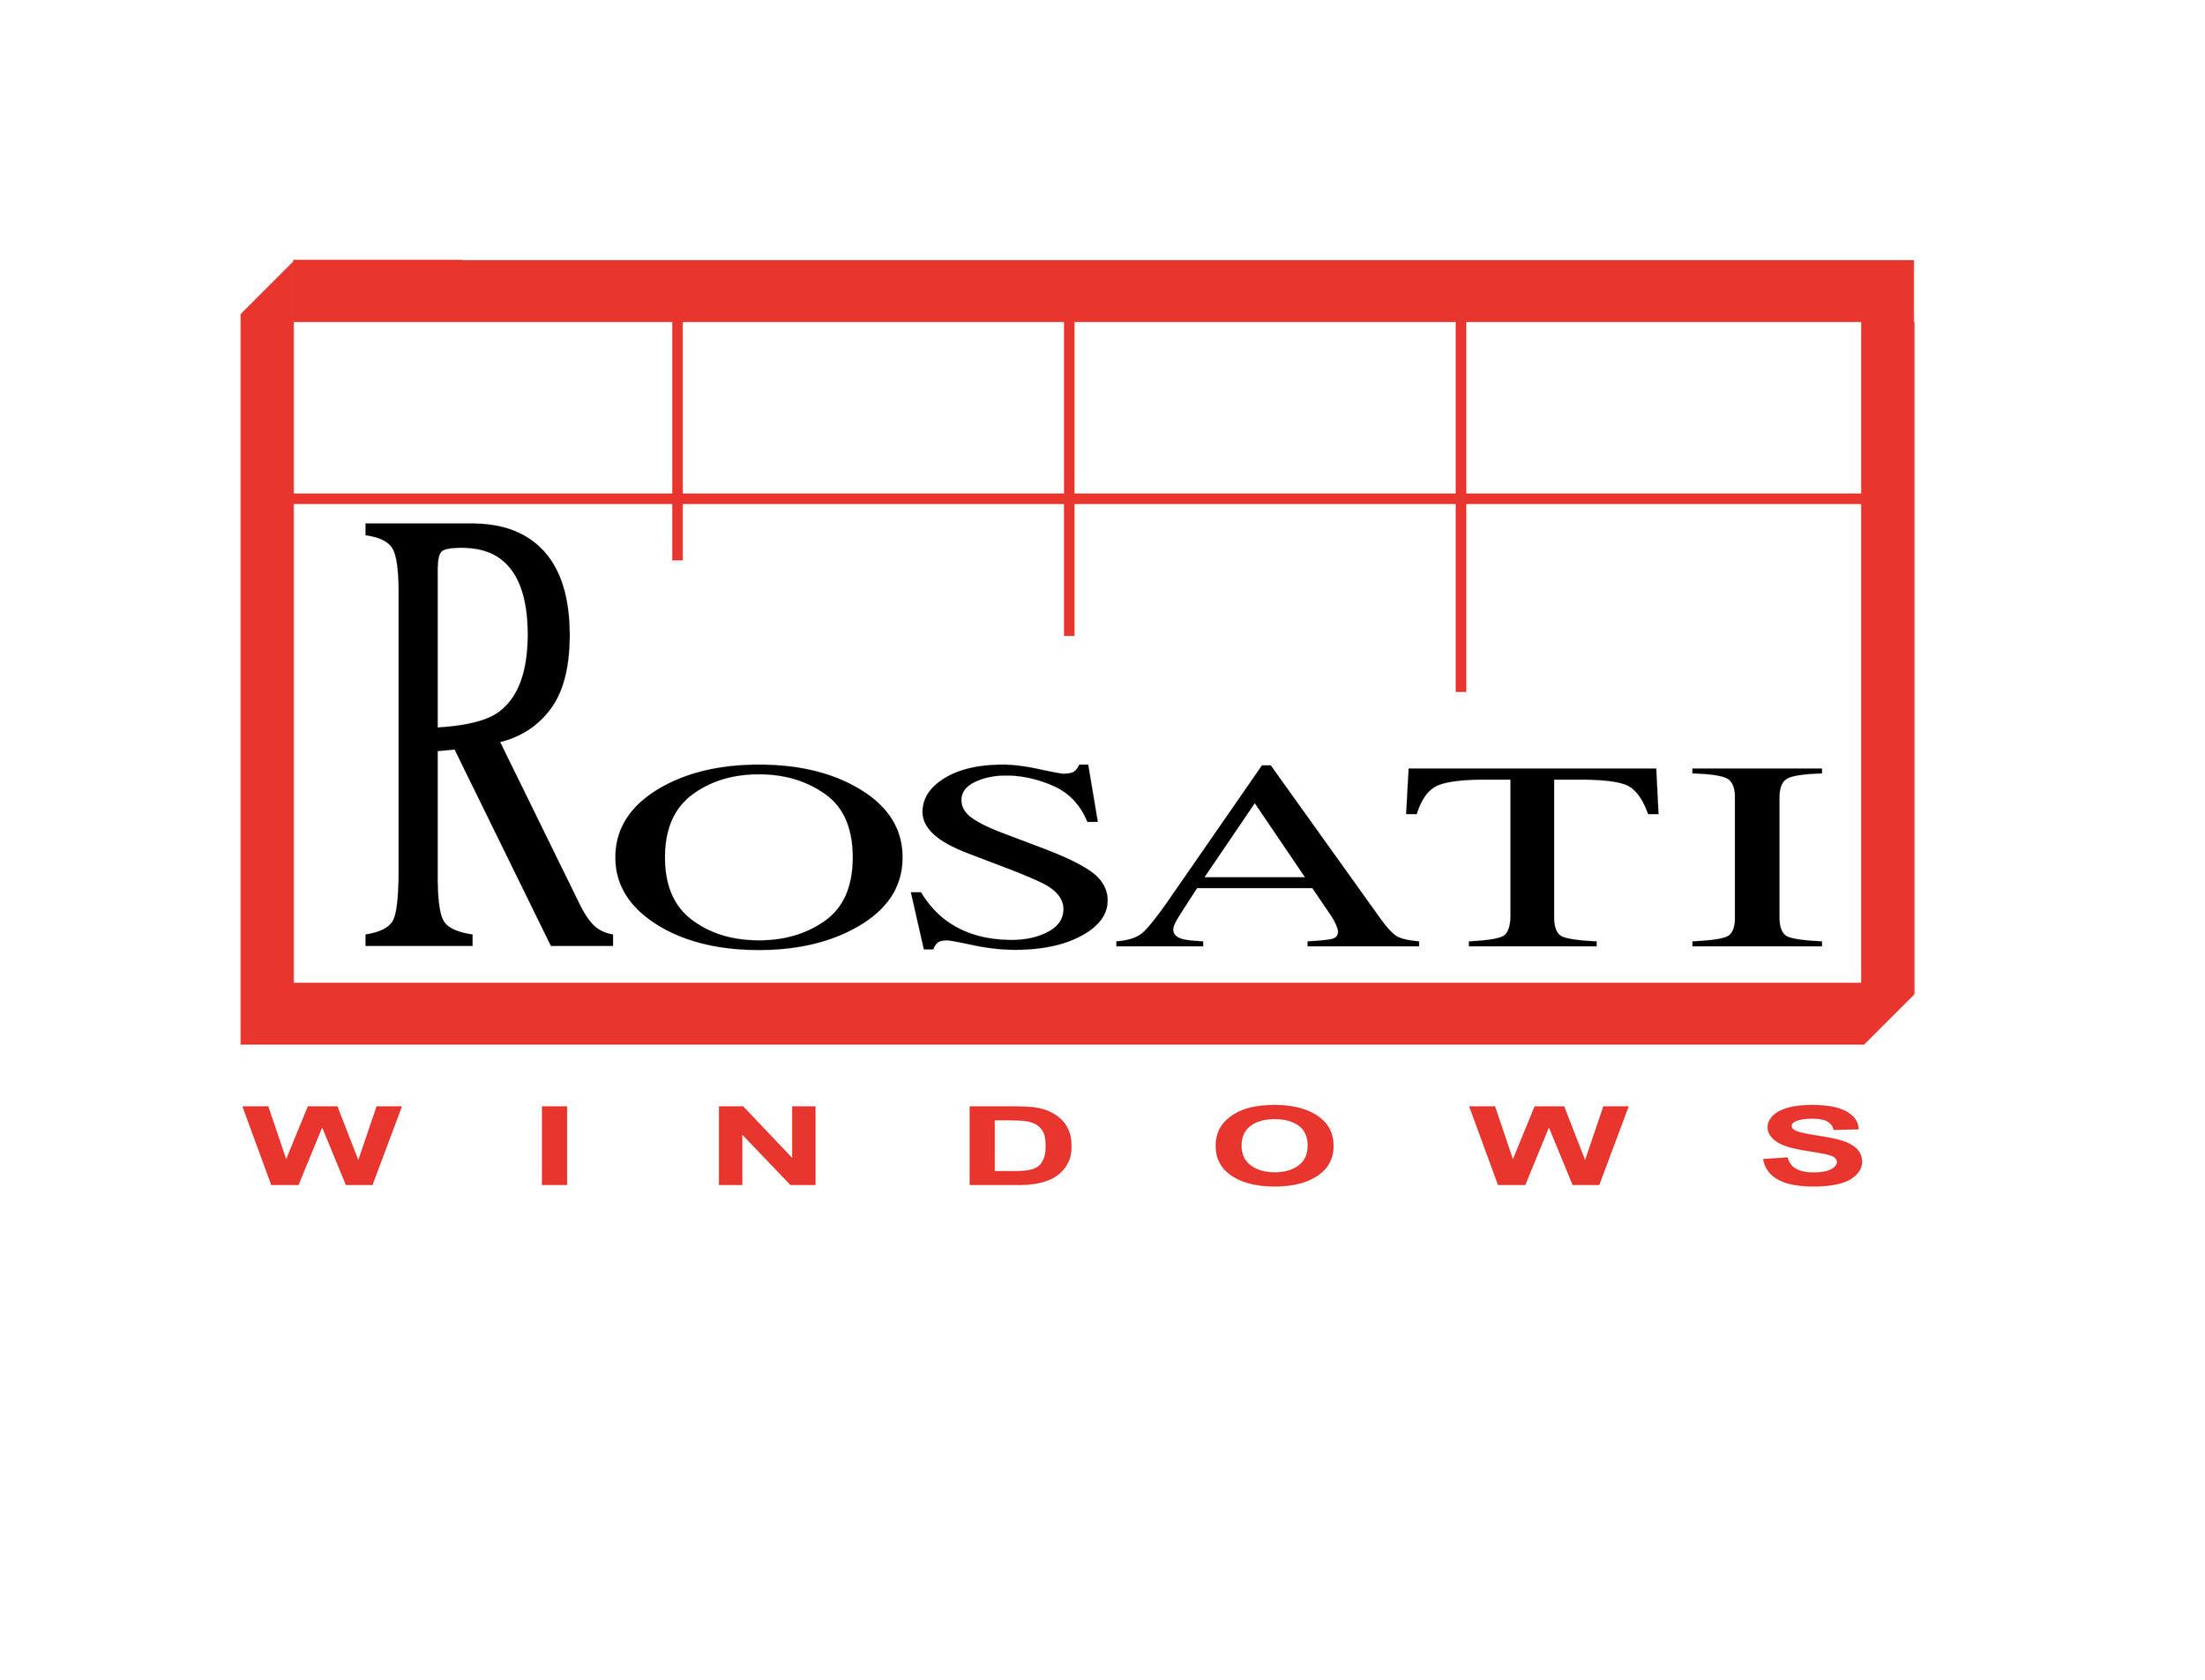 Rosati Windows - Outstanding Corporate Community Service